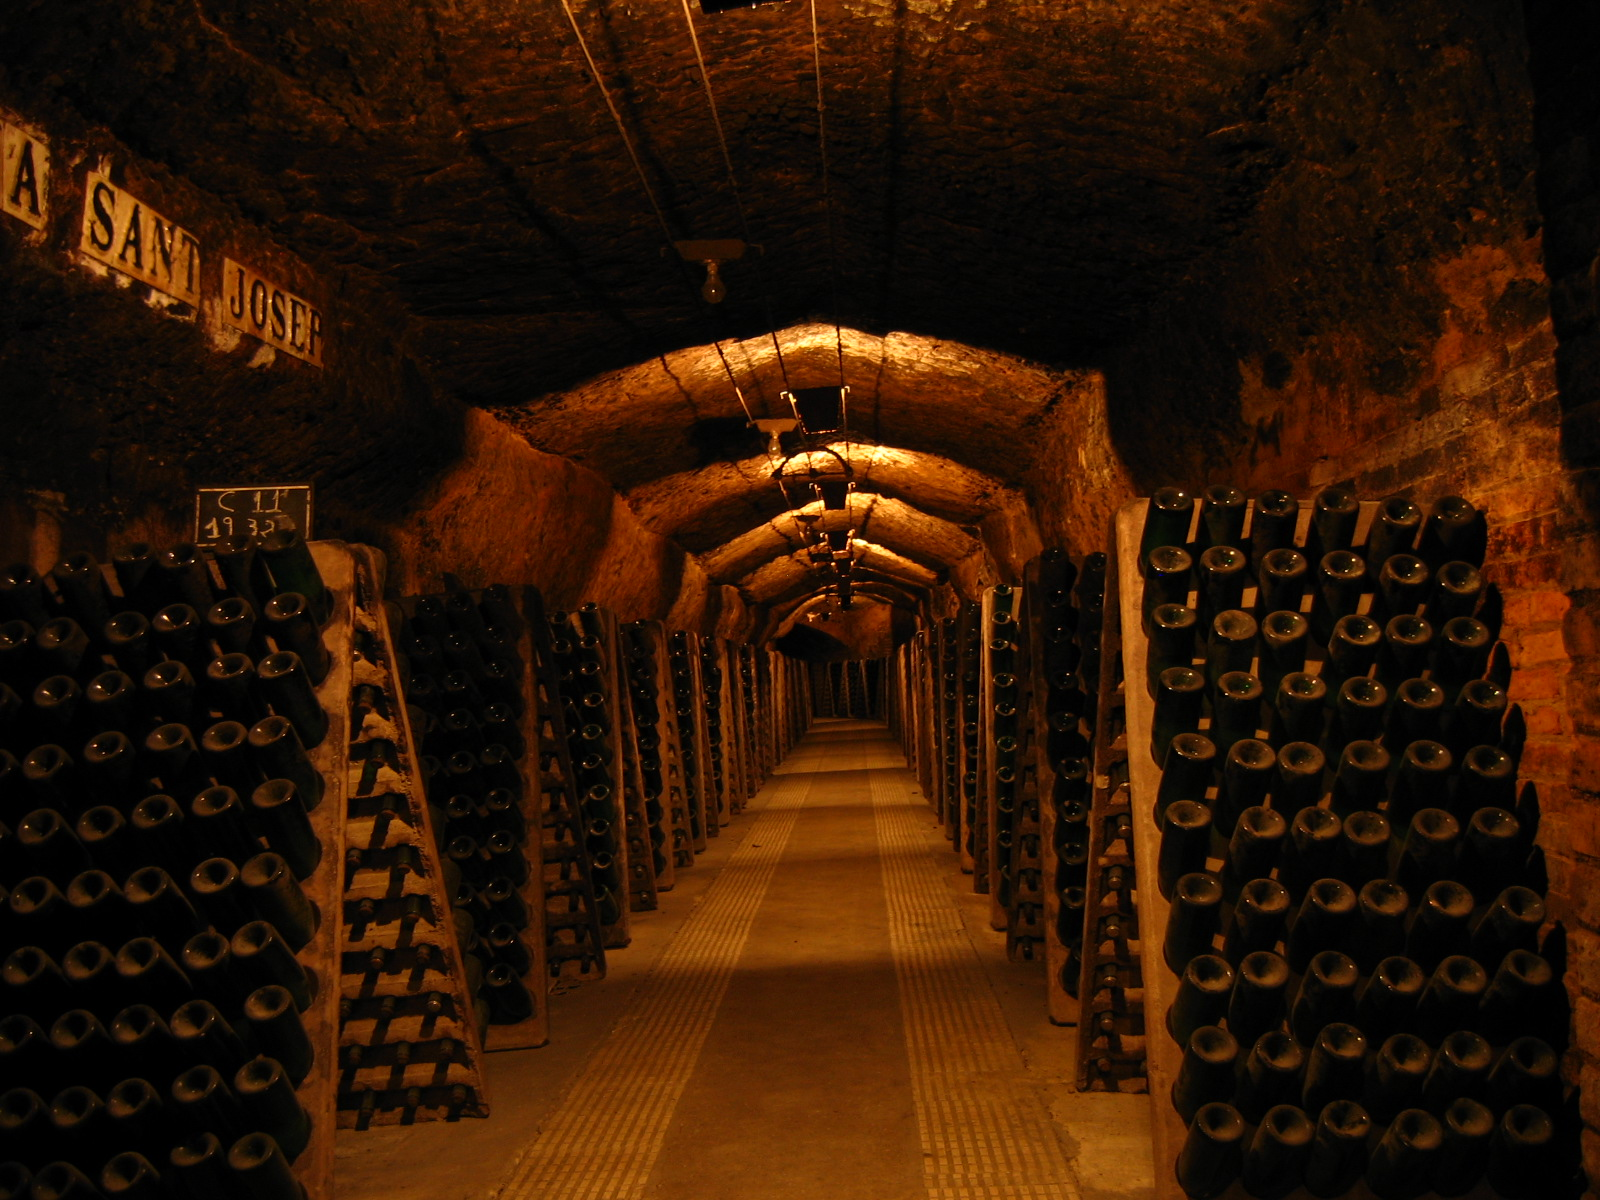 Wine Cellar Wallpaper : Wine cellar by restmlinstock on deviantart